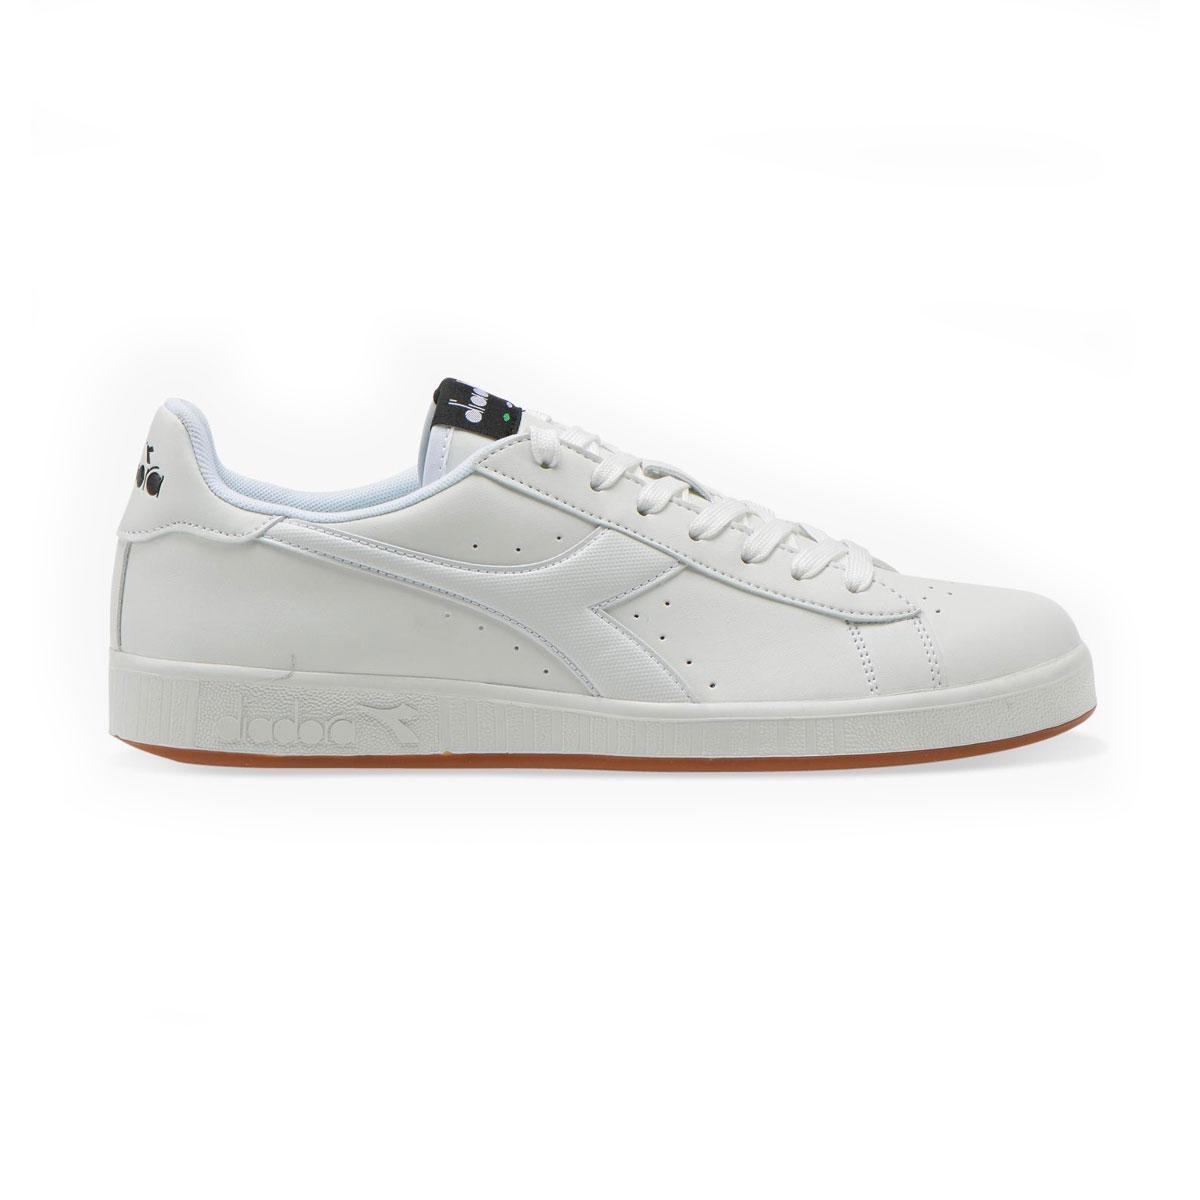 Scarpe Sneakers Diadora Game P basse da uomo rif. 101.160281 01 C0657